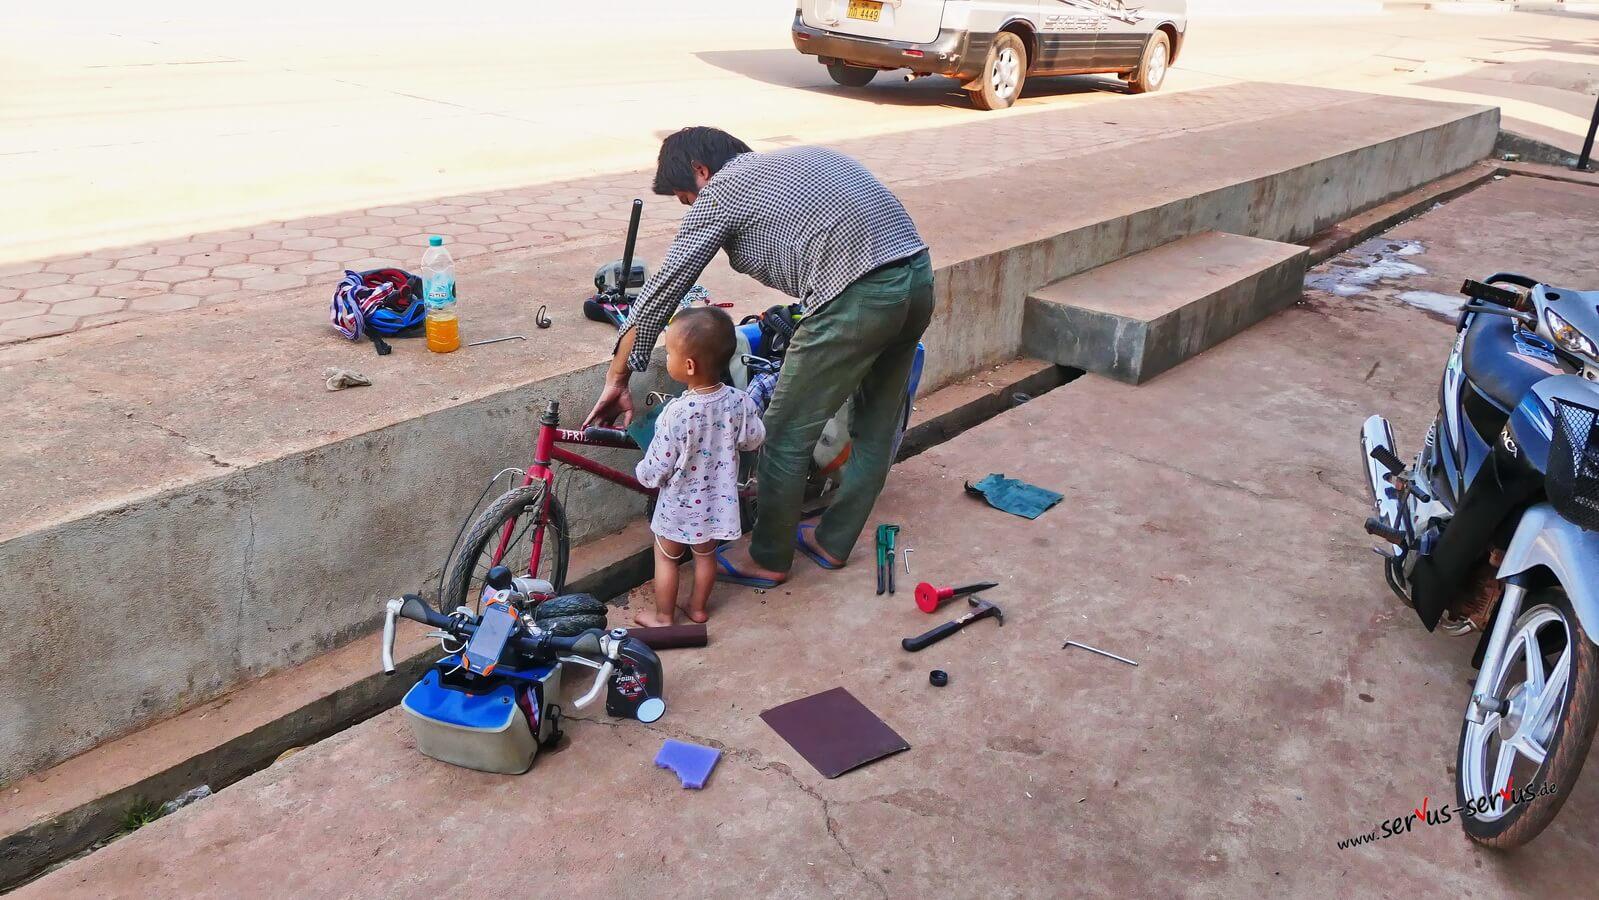 Fahrradreparatur am Straßenrand in Laos